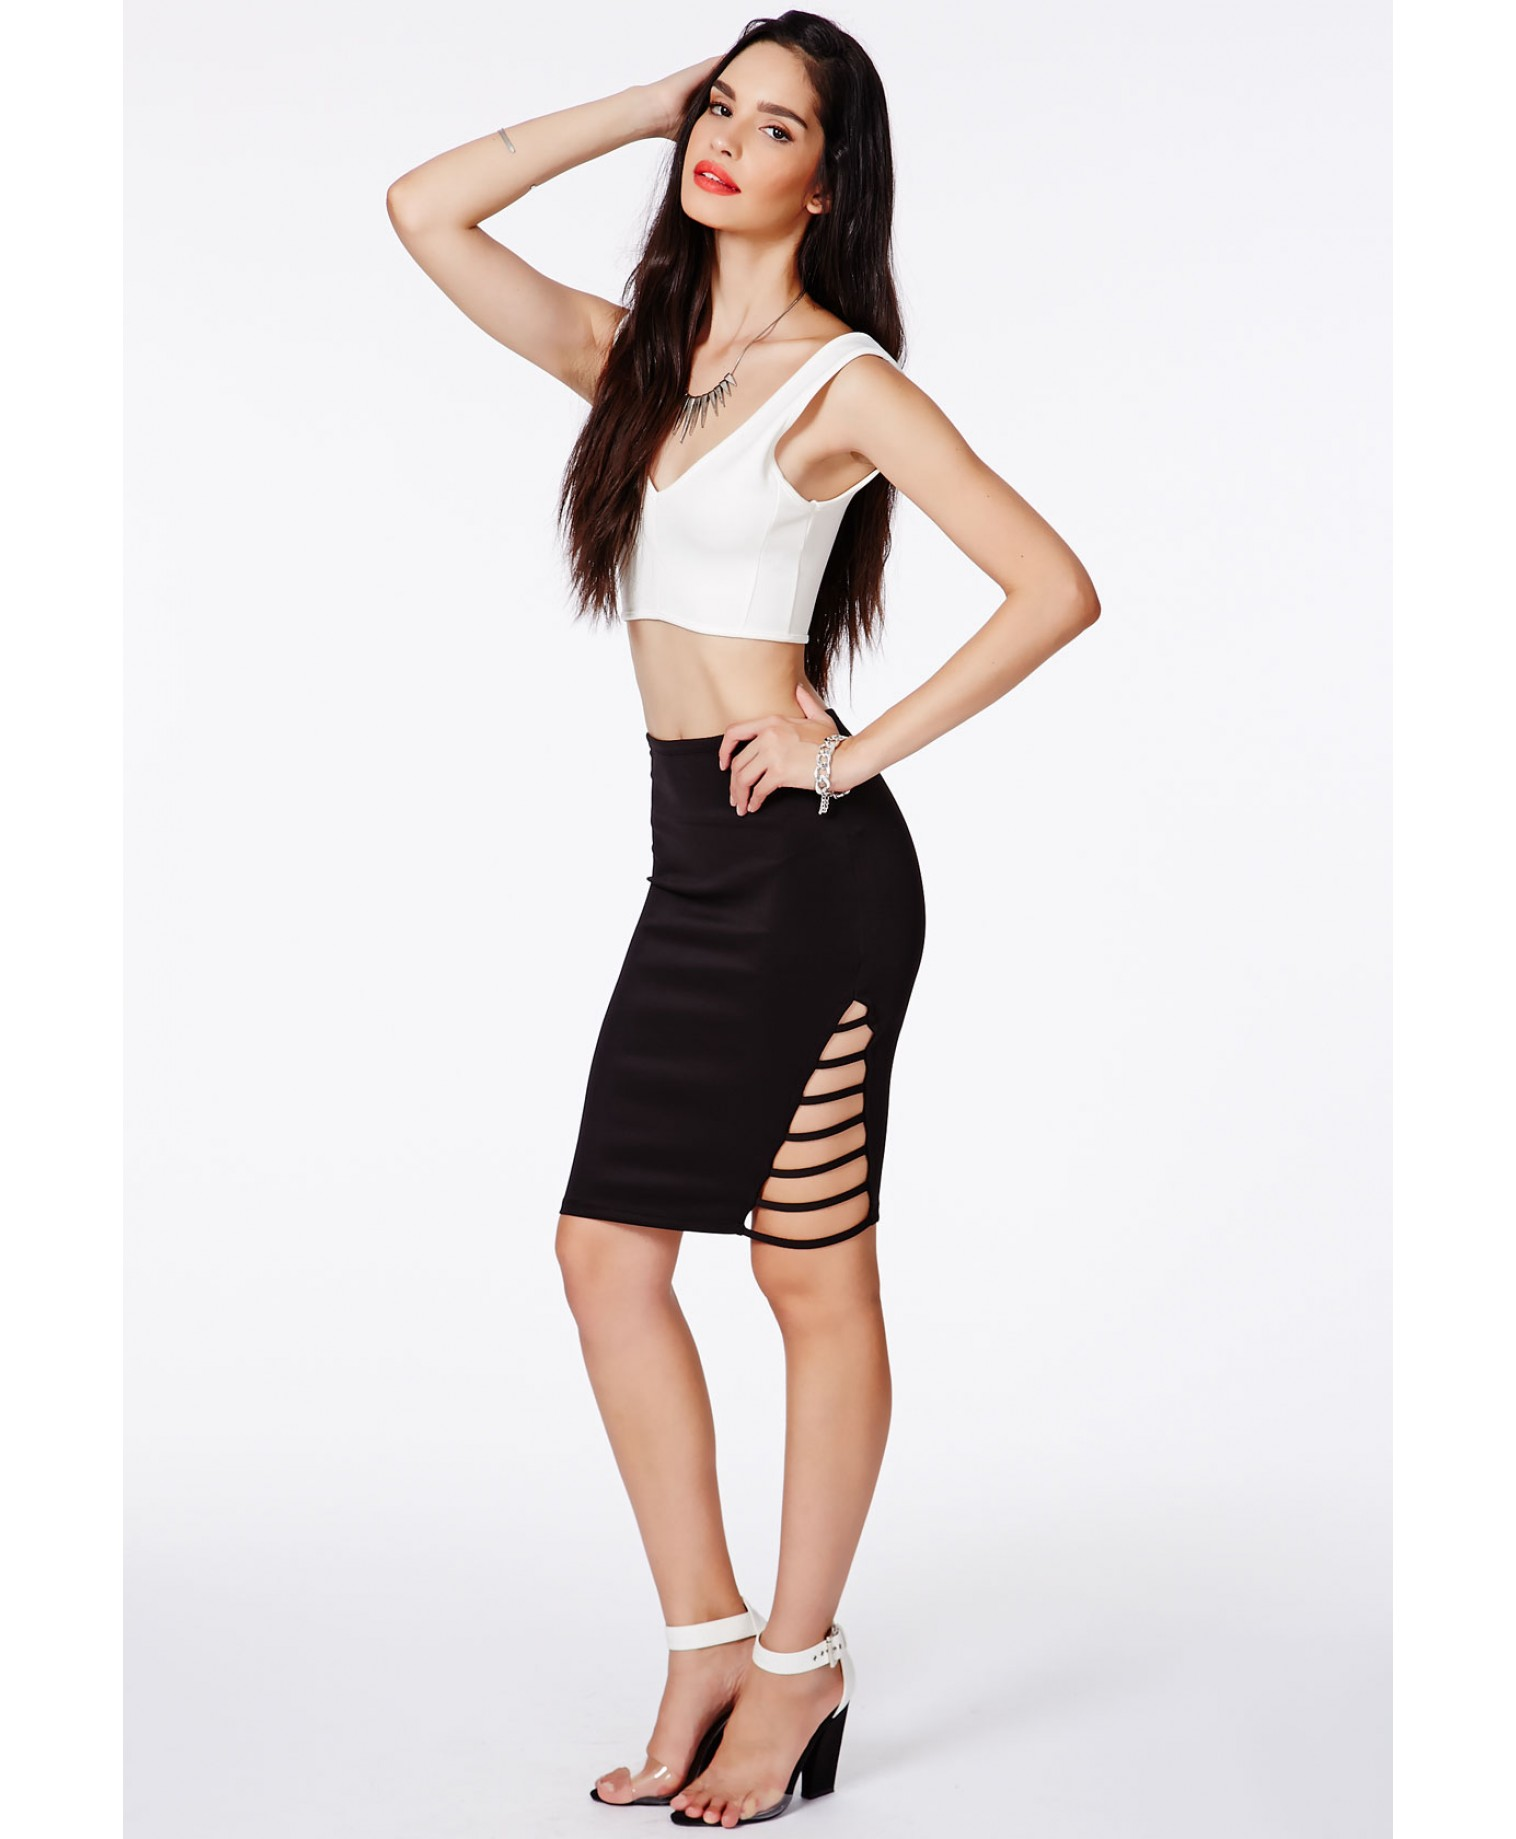 New Micro Miniskirt Reviews  Online Shopping Reviews On Micro Miniskirt